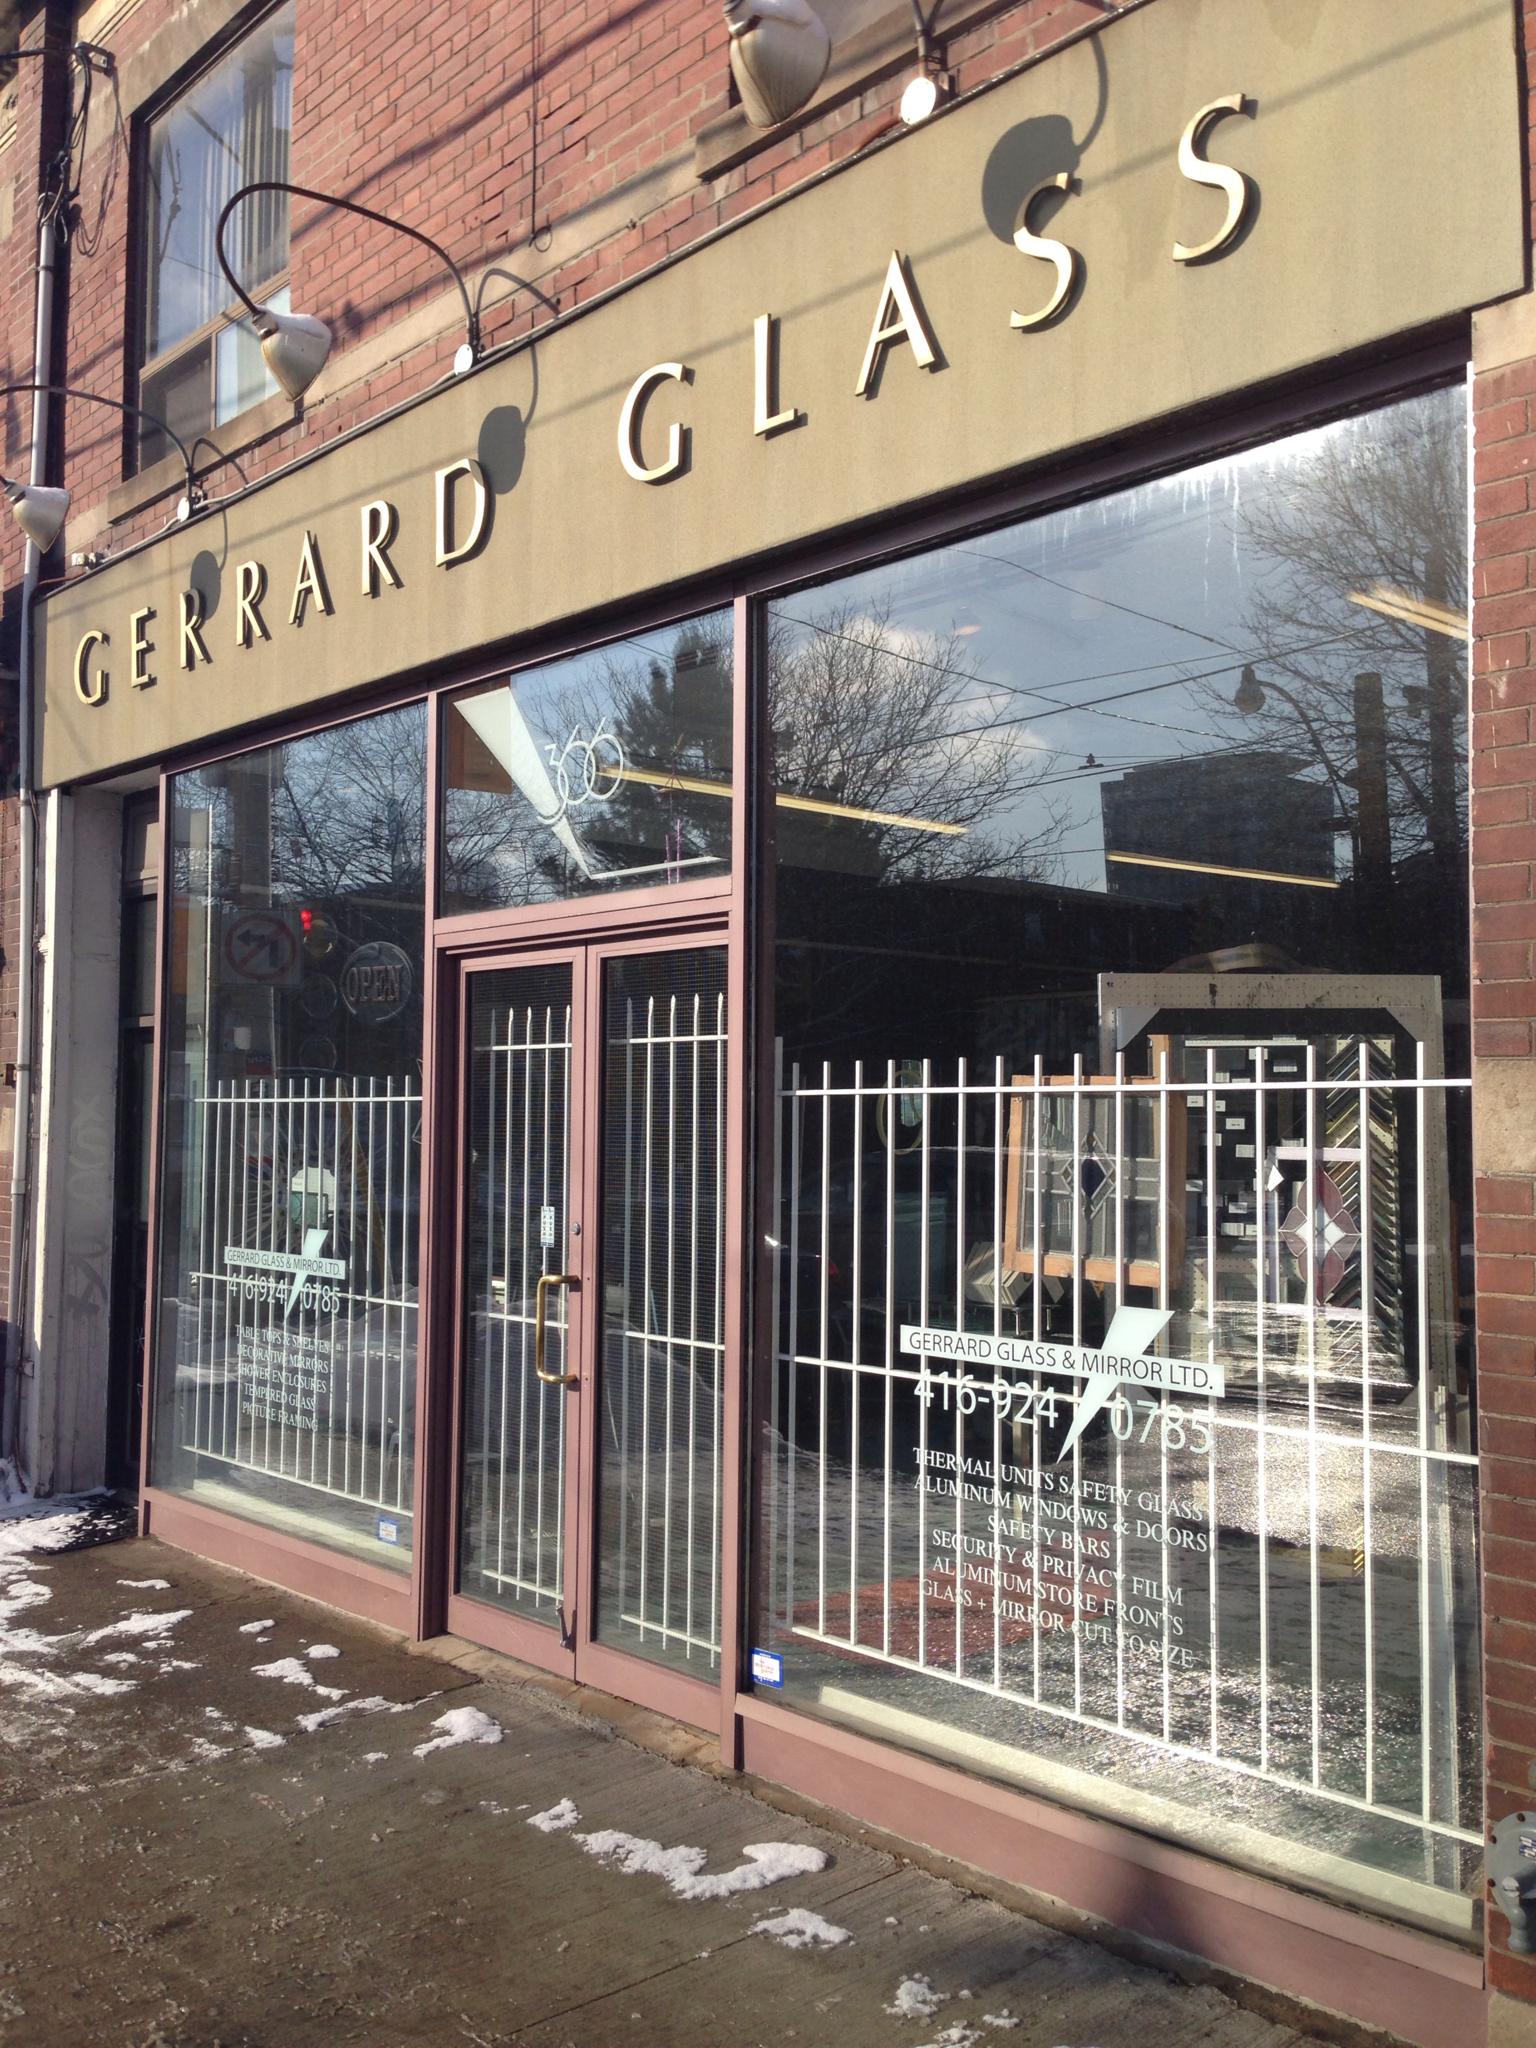 Gerrard Glass & Mirror Ltd 366 Gerrard St E Toronto, ON Auto Glass